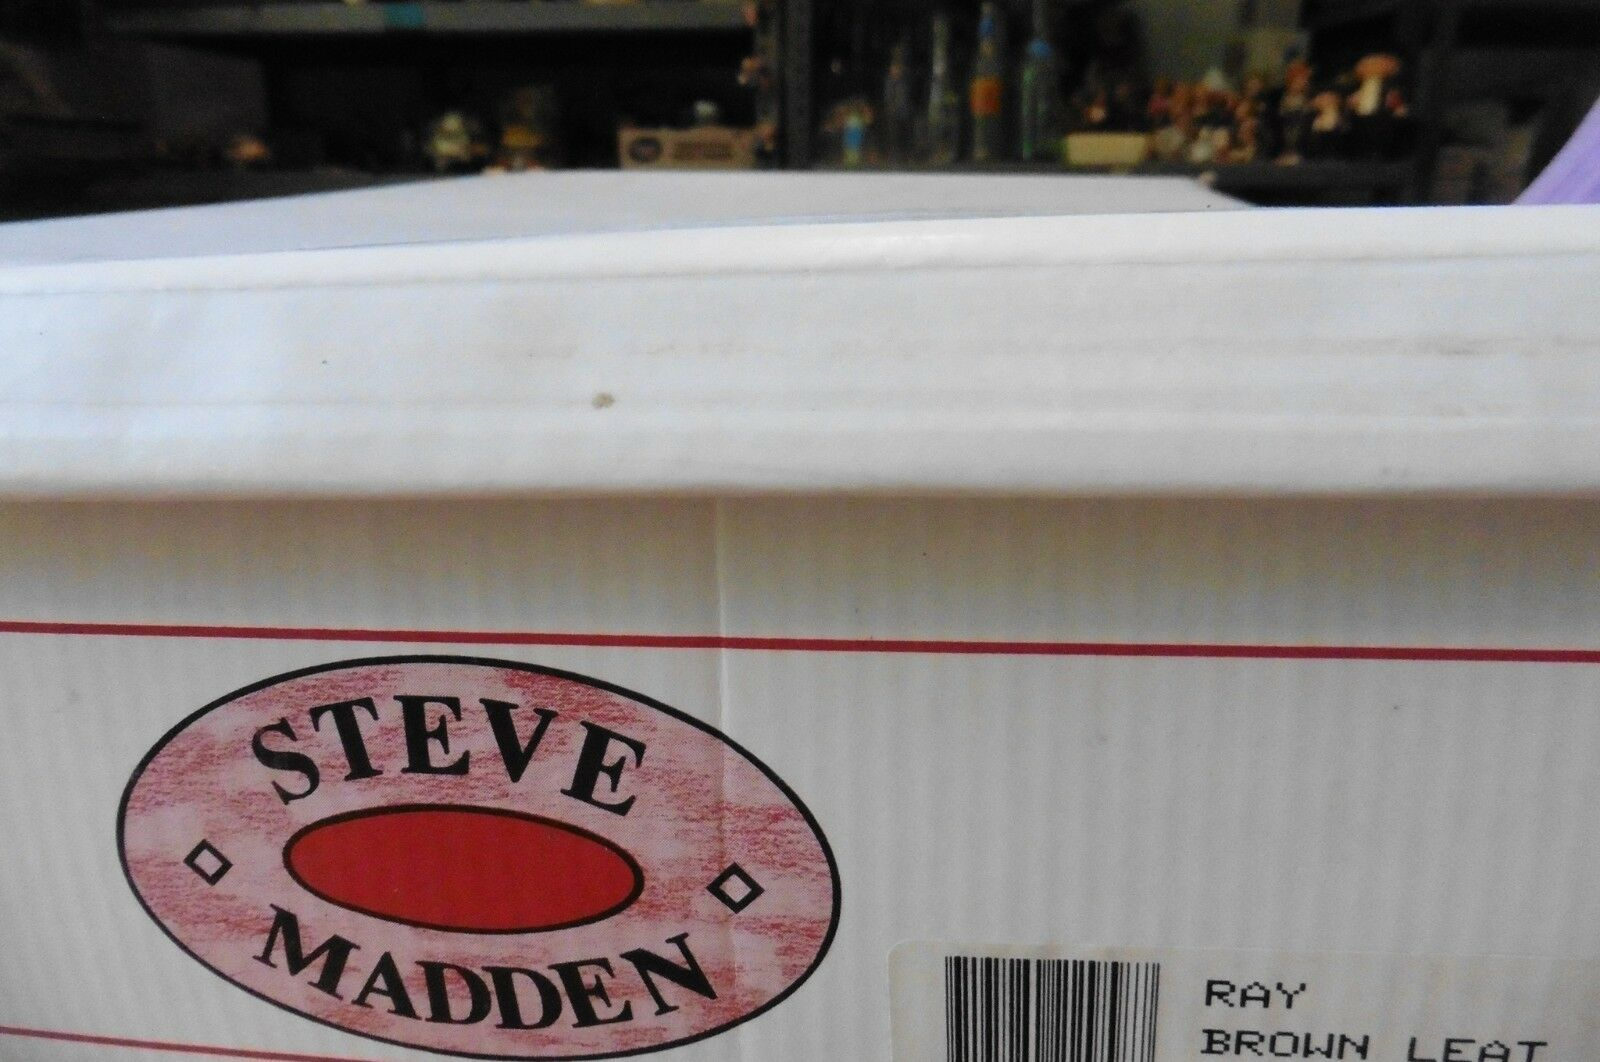 NEW Steve Madden Braun Leder Leder Leder Damenschuhe Stiefel Ray Brazil sz 6.5 mid-calf high heel 954300